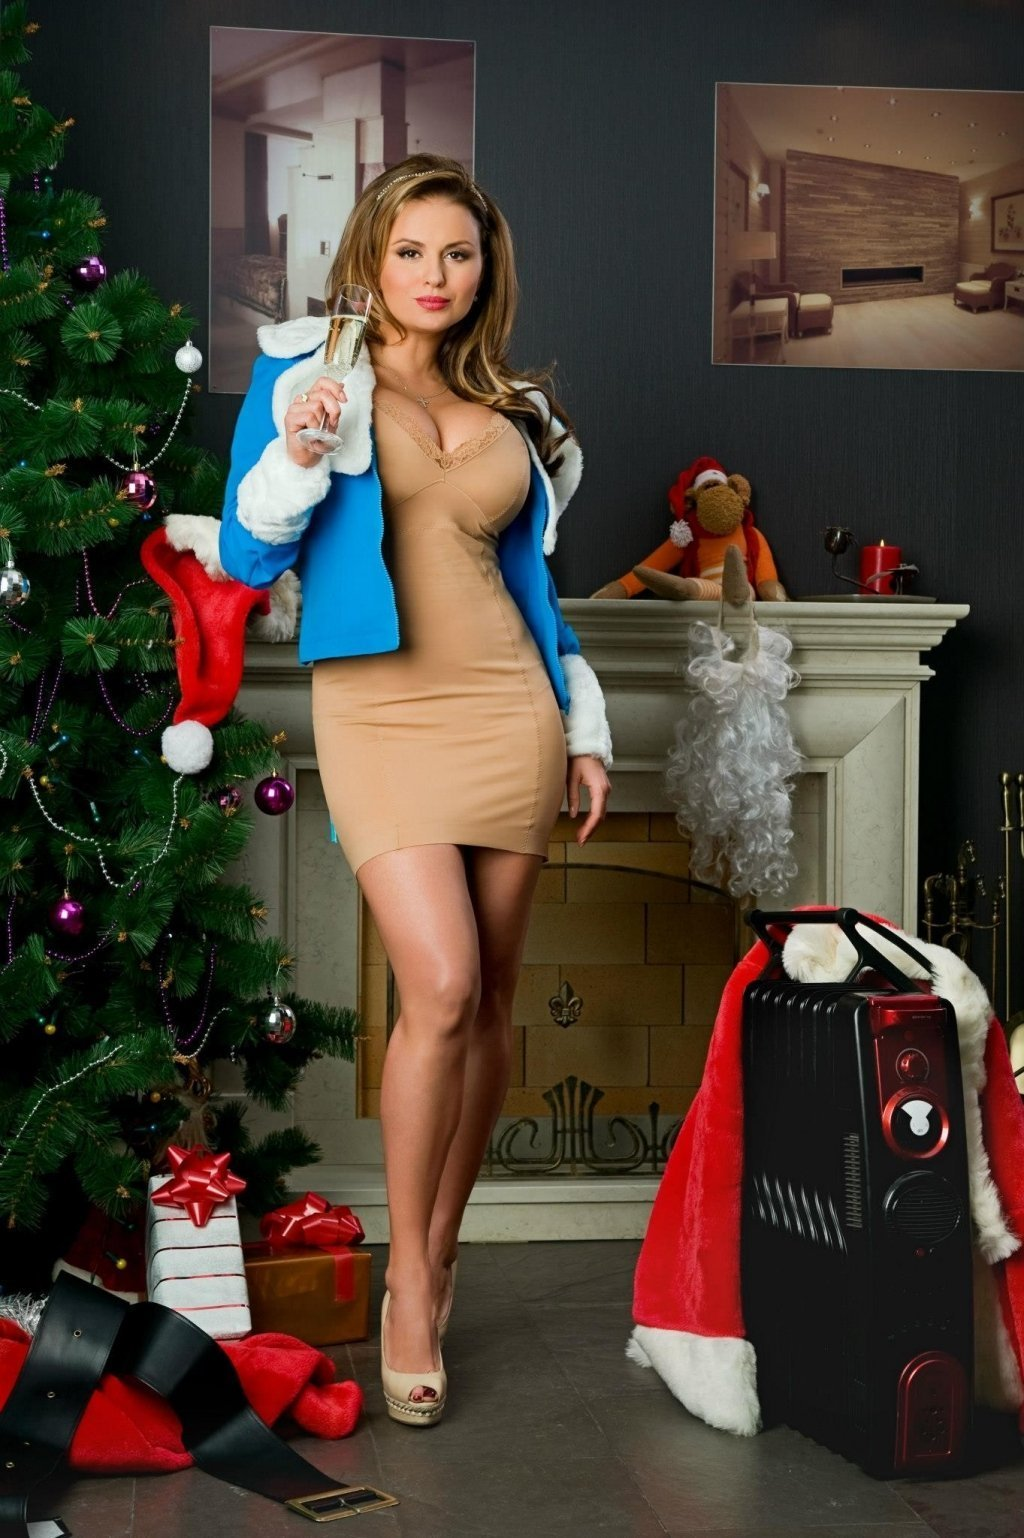 Звезда Анна Семенович показала голые прелести. Бесплатно на Starsru.ru